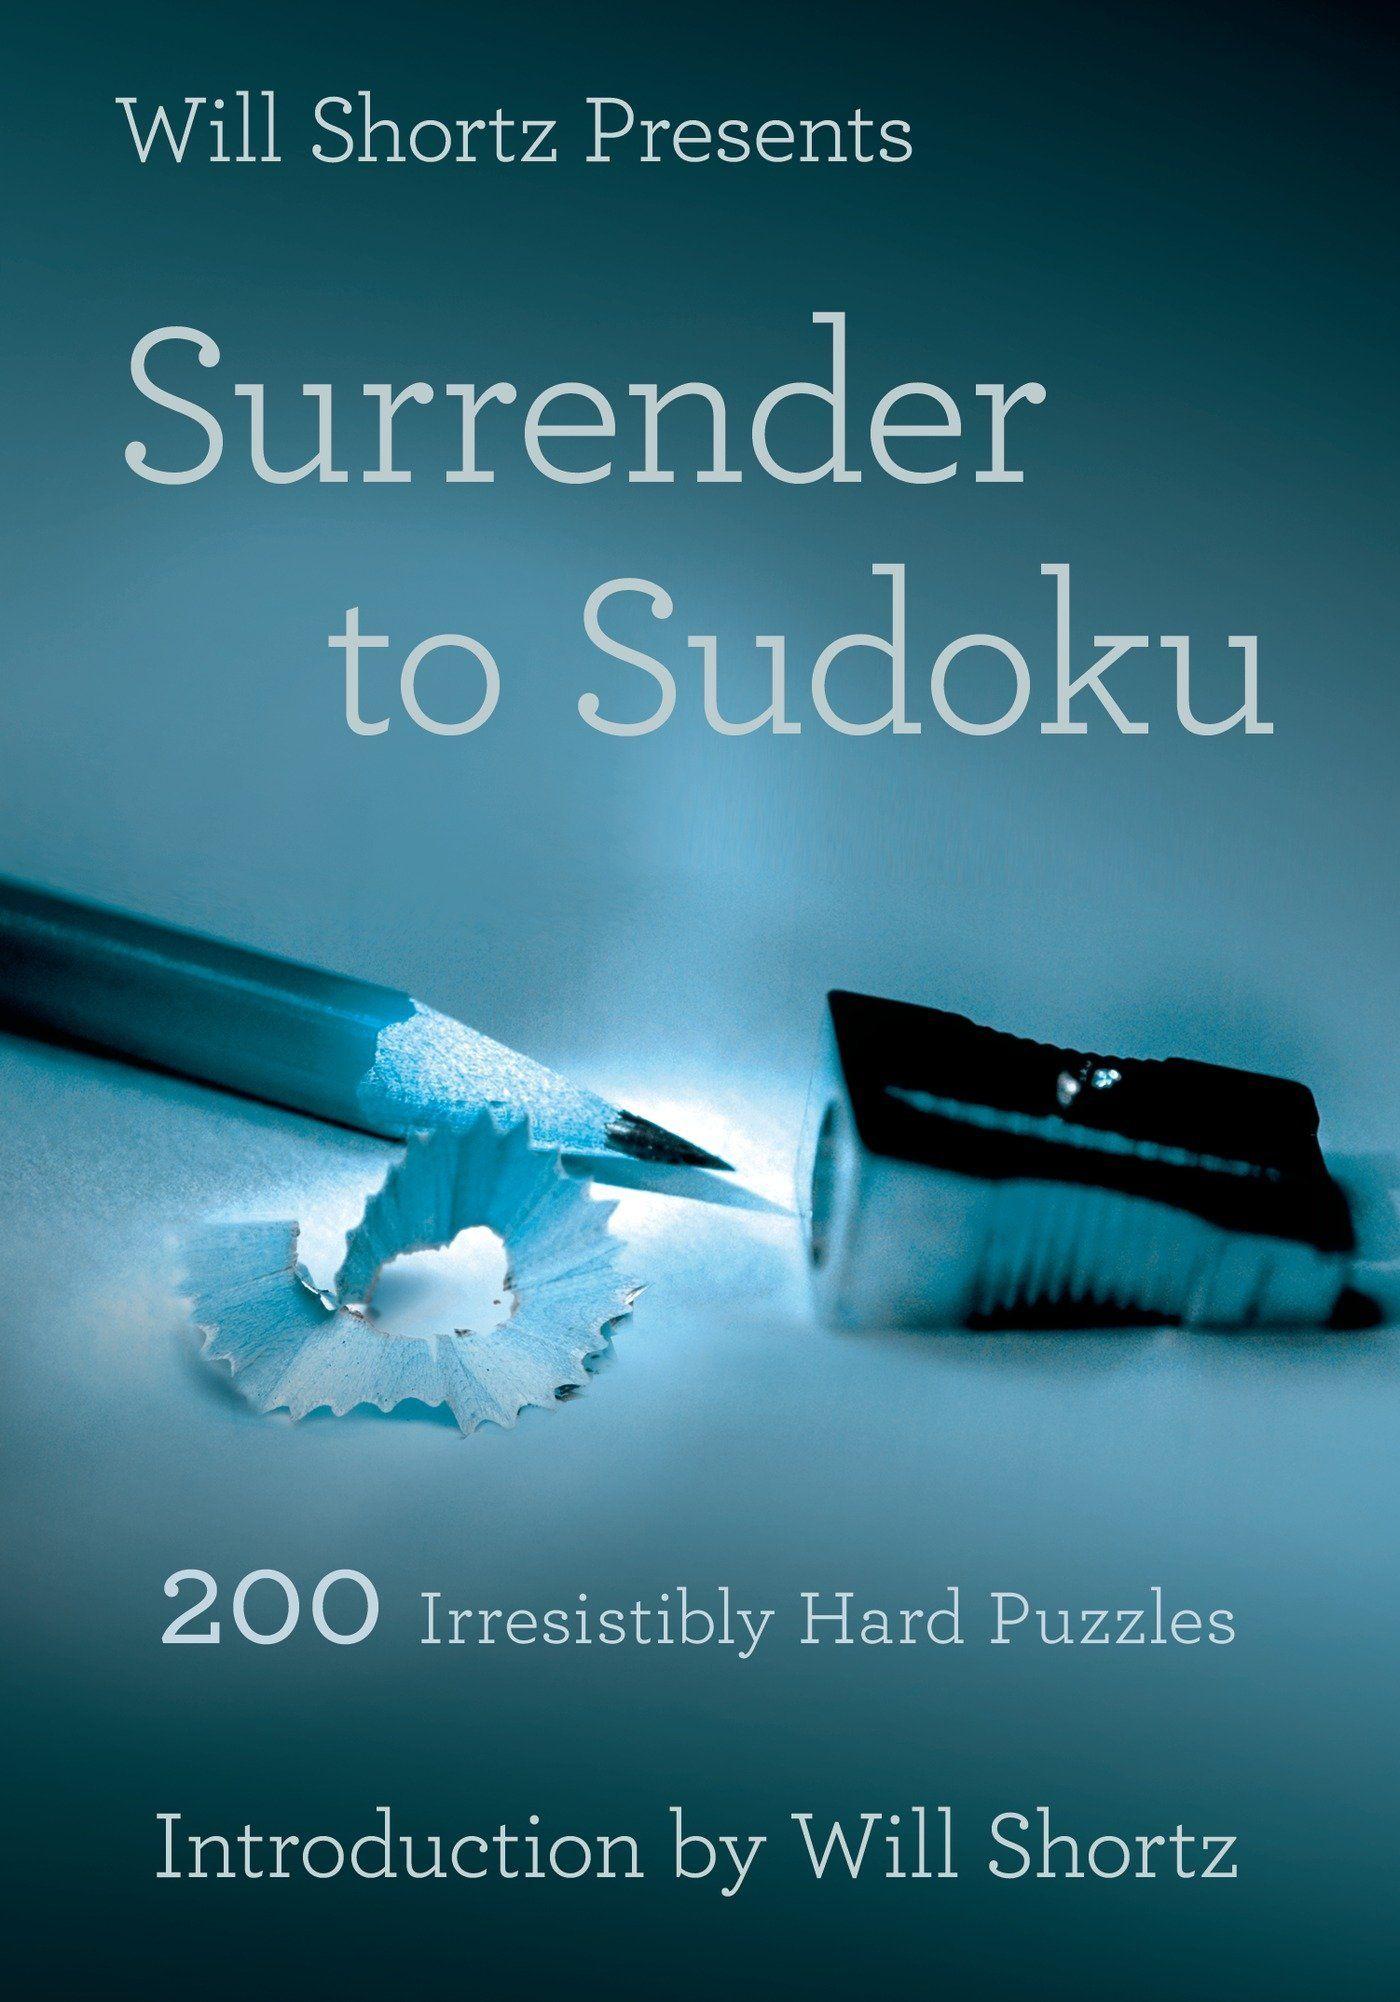 Will Shortz Presents Surrender to Sudoku: 200 Irresistibly Hard Puzzles (Will  Shortz Presents)